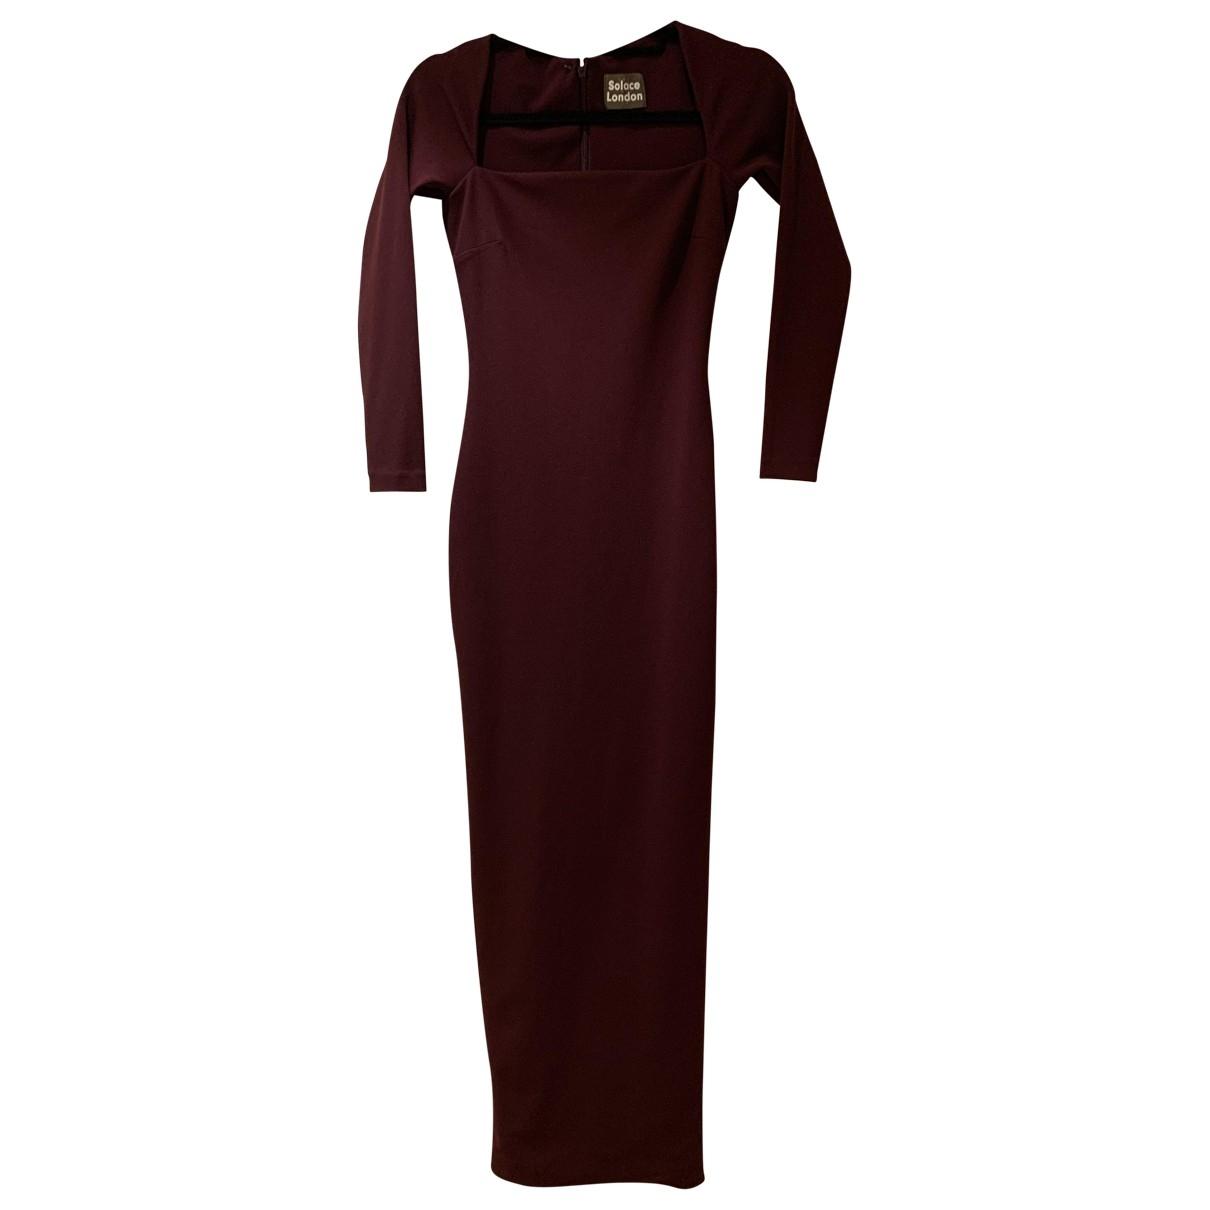 Solace London \N Kleid in  Bordeauxrot Polyester